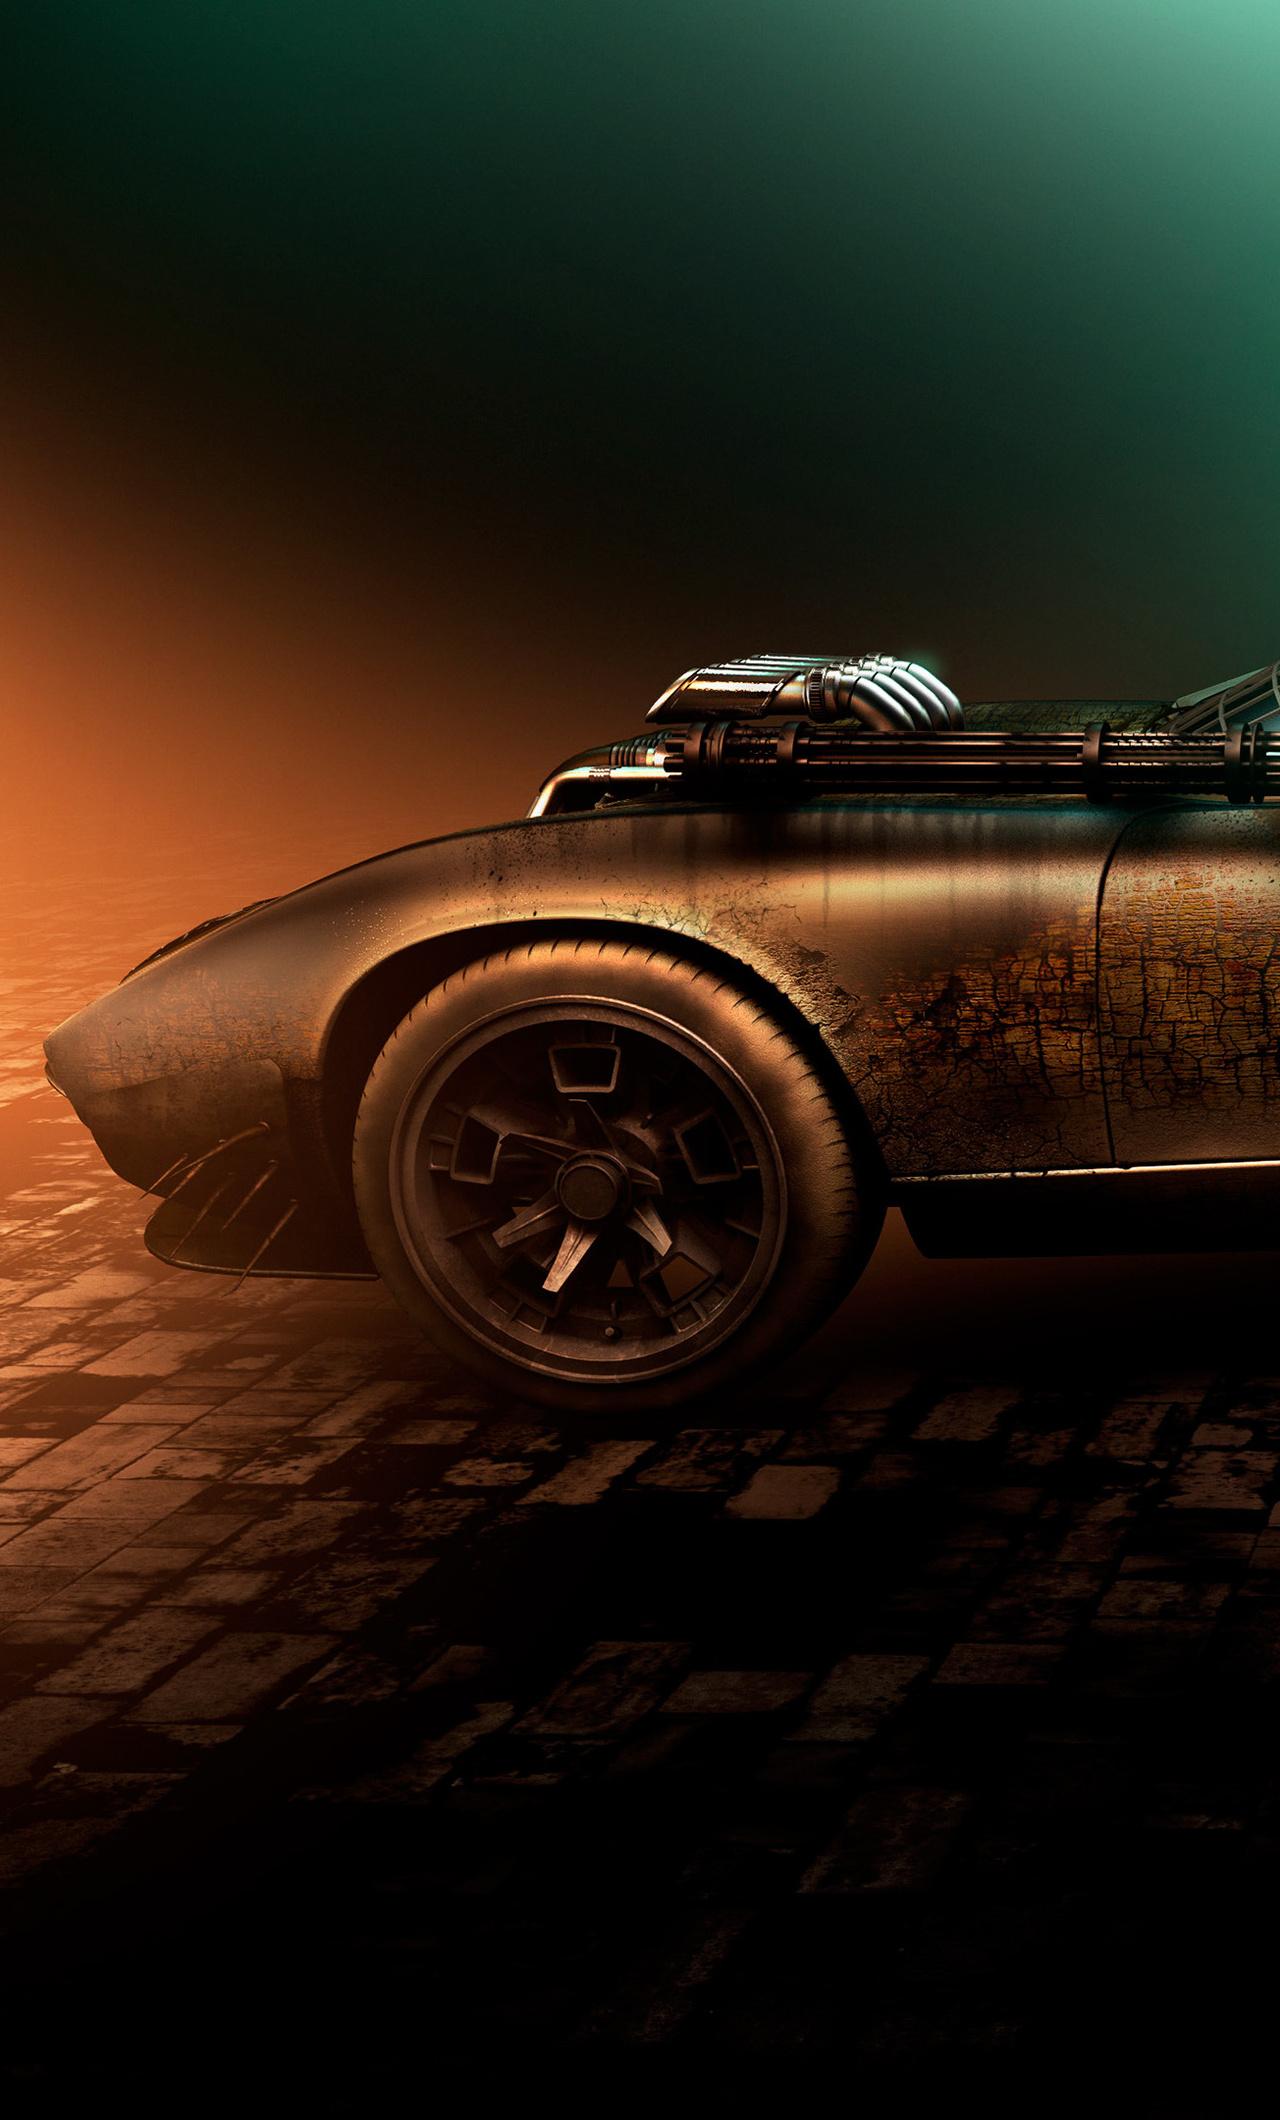 1280x2120 Lamborghini Miura Mad Max Iphone 6 Hd 4k Wallpapers